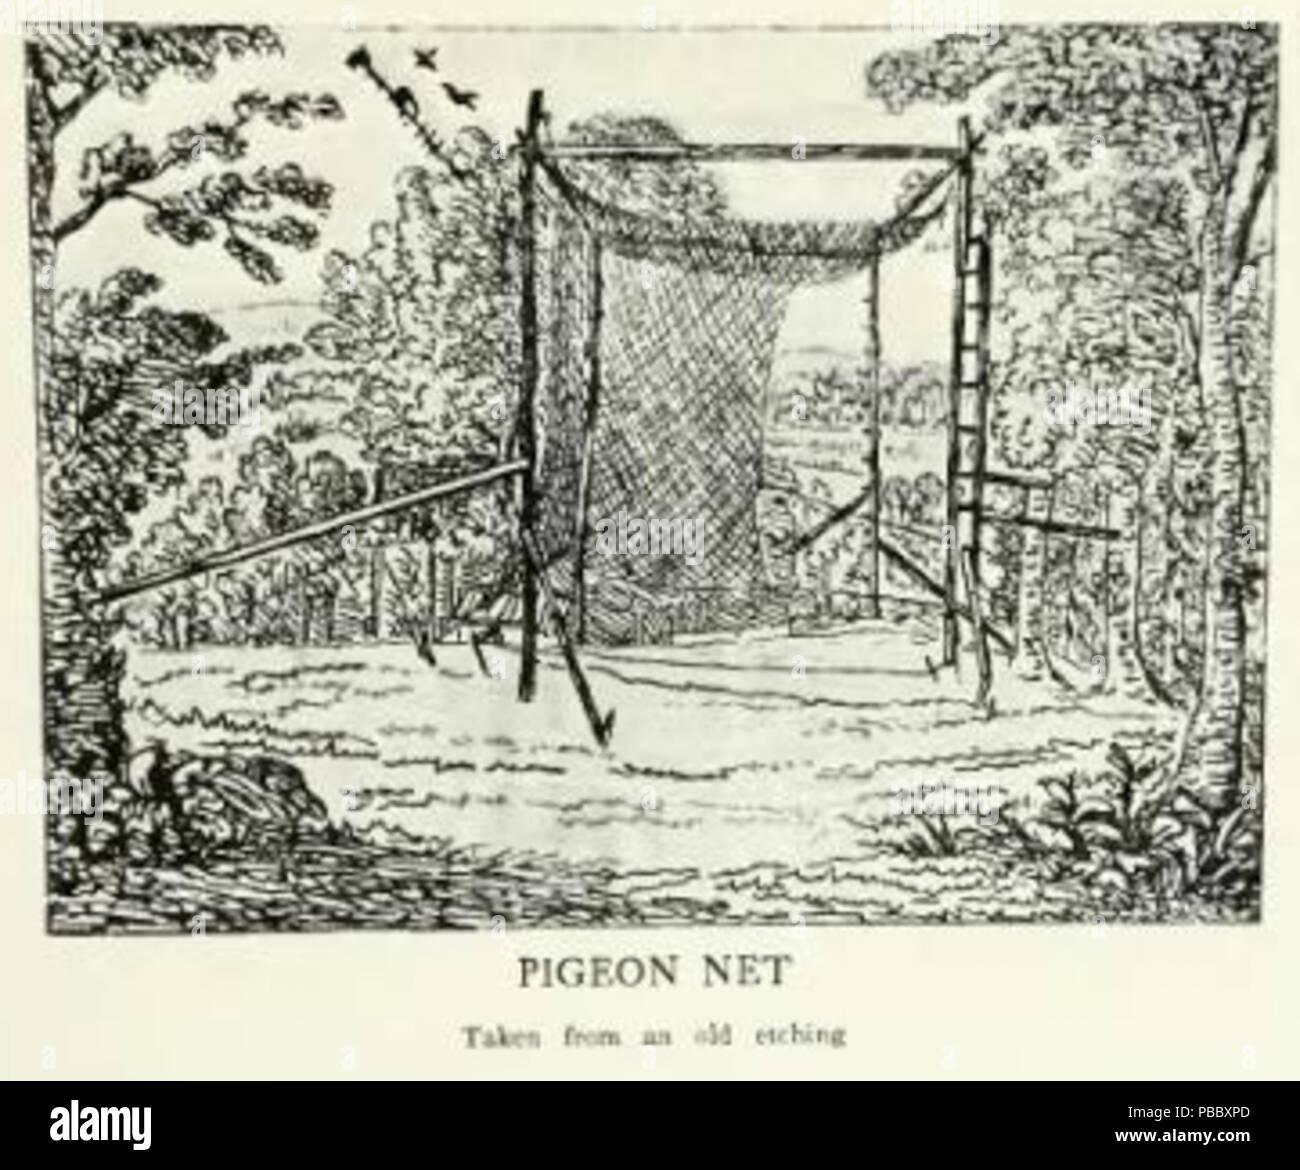 1153 Page The Passenger Pigeon - Mershon djvu 254 - Pigeon net